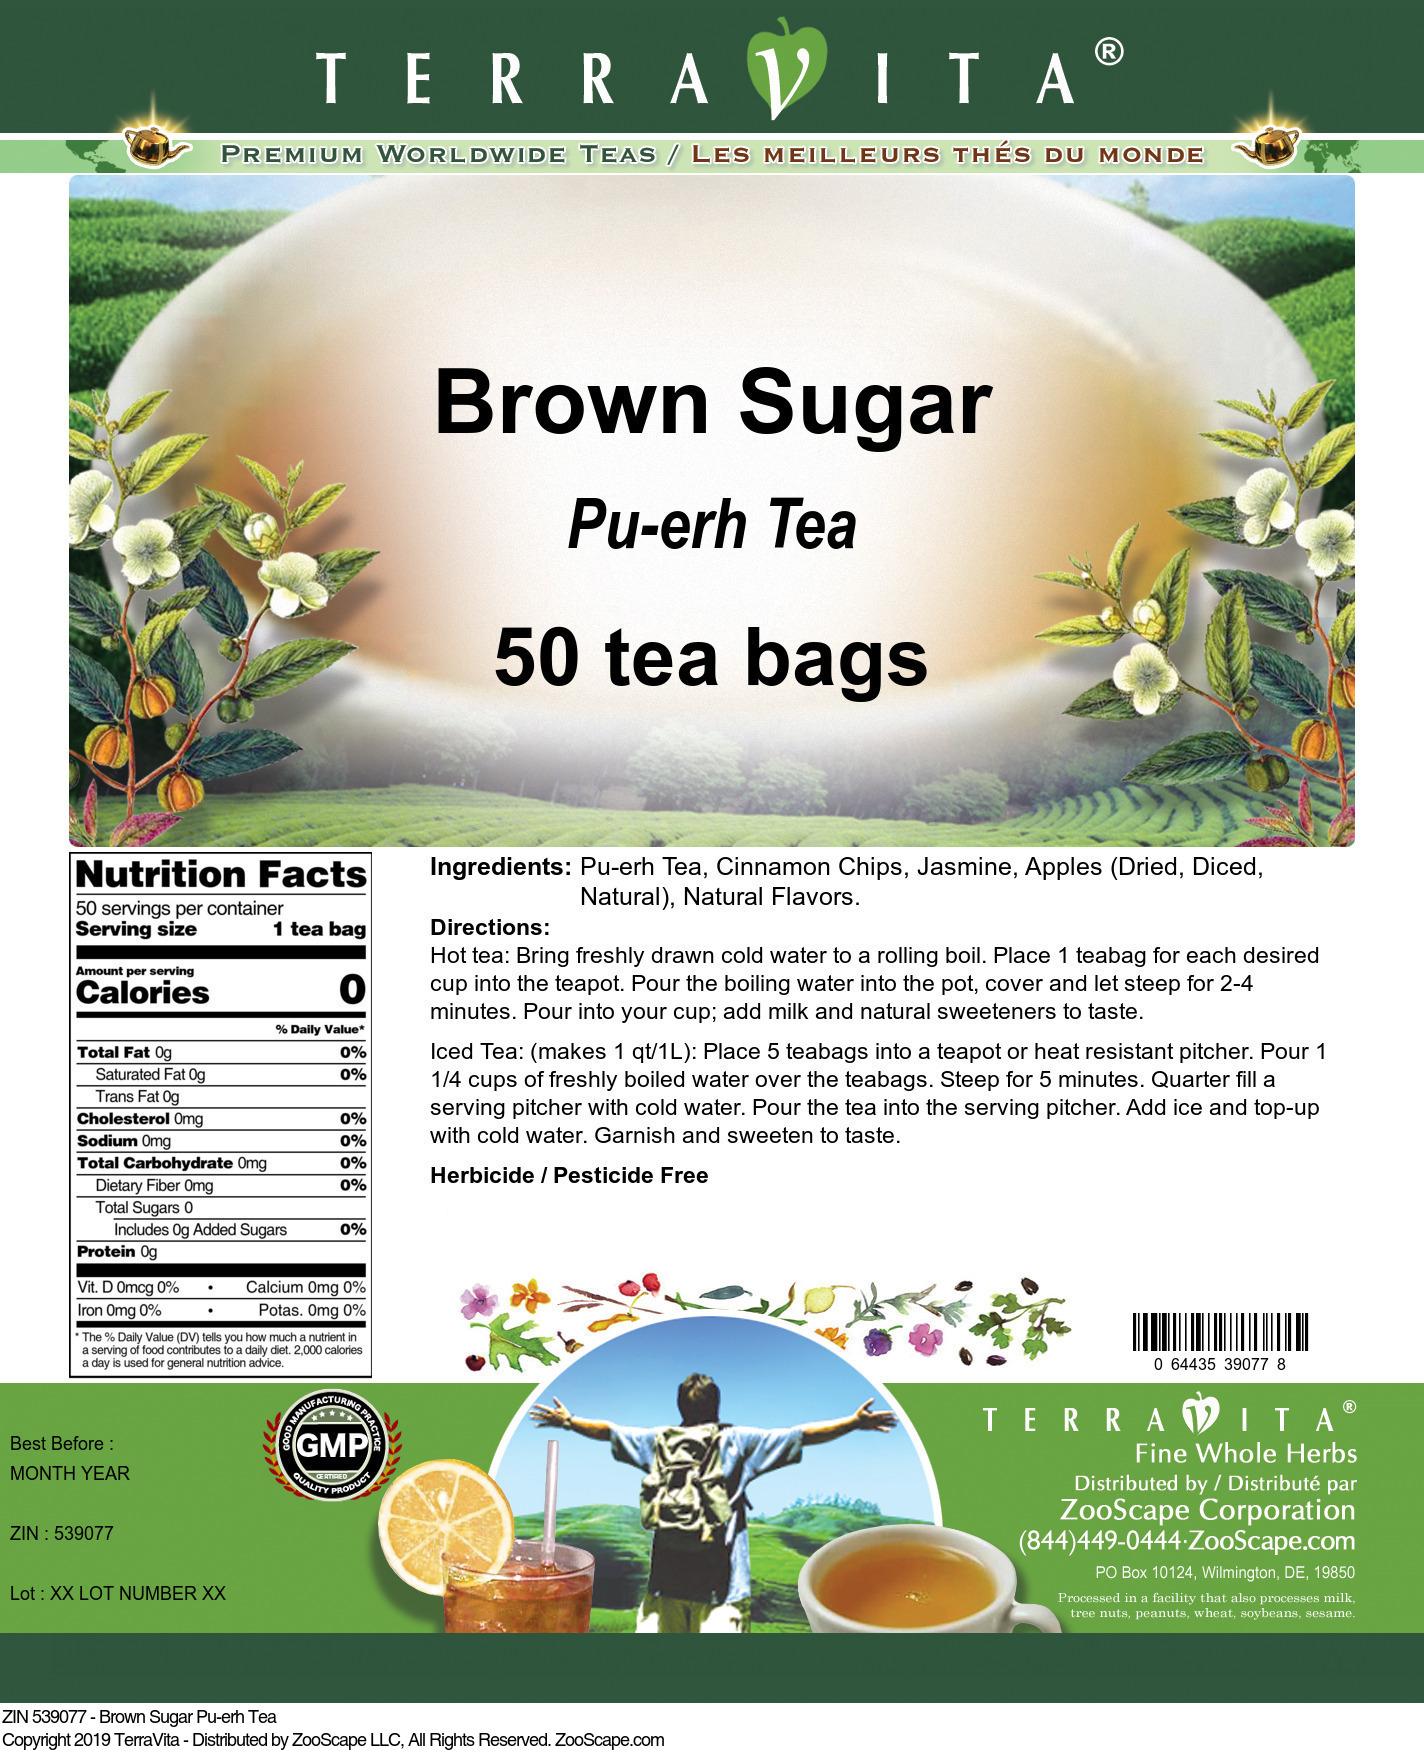 Brown Sugar Pu-erh Tea